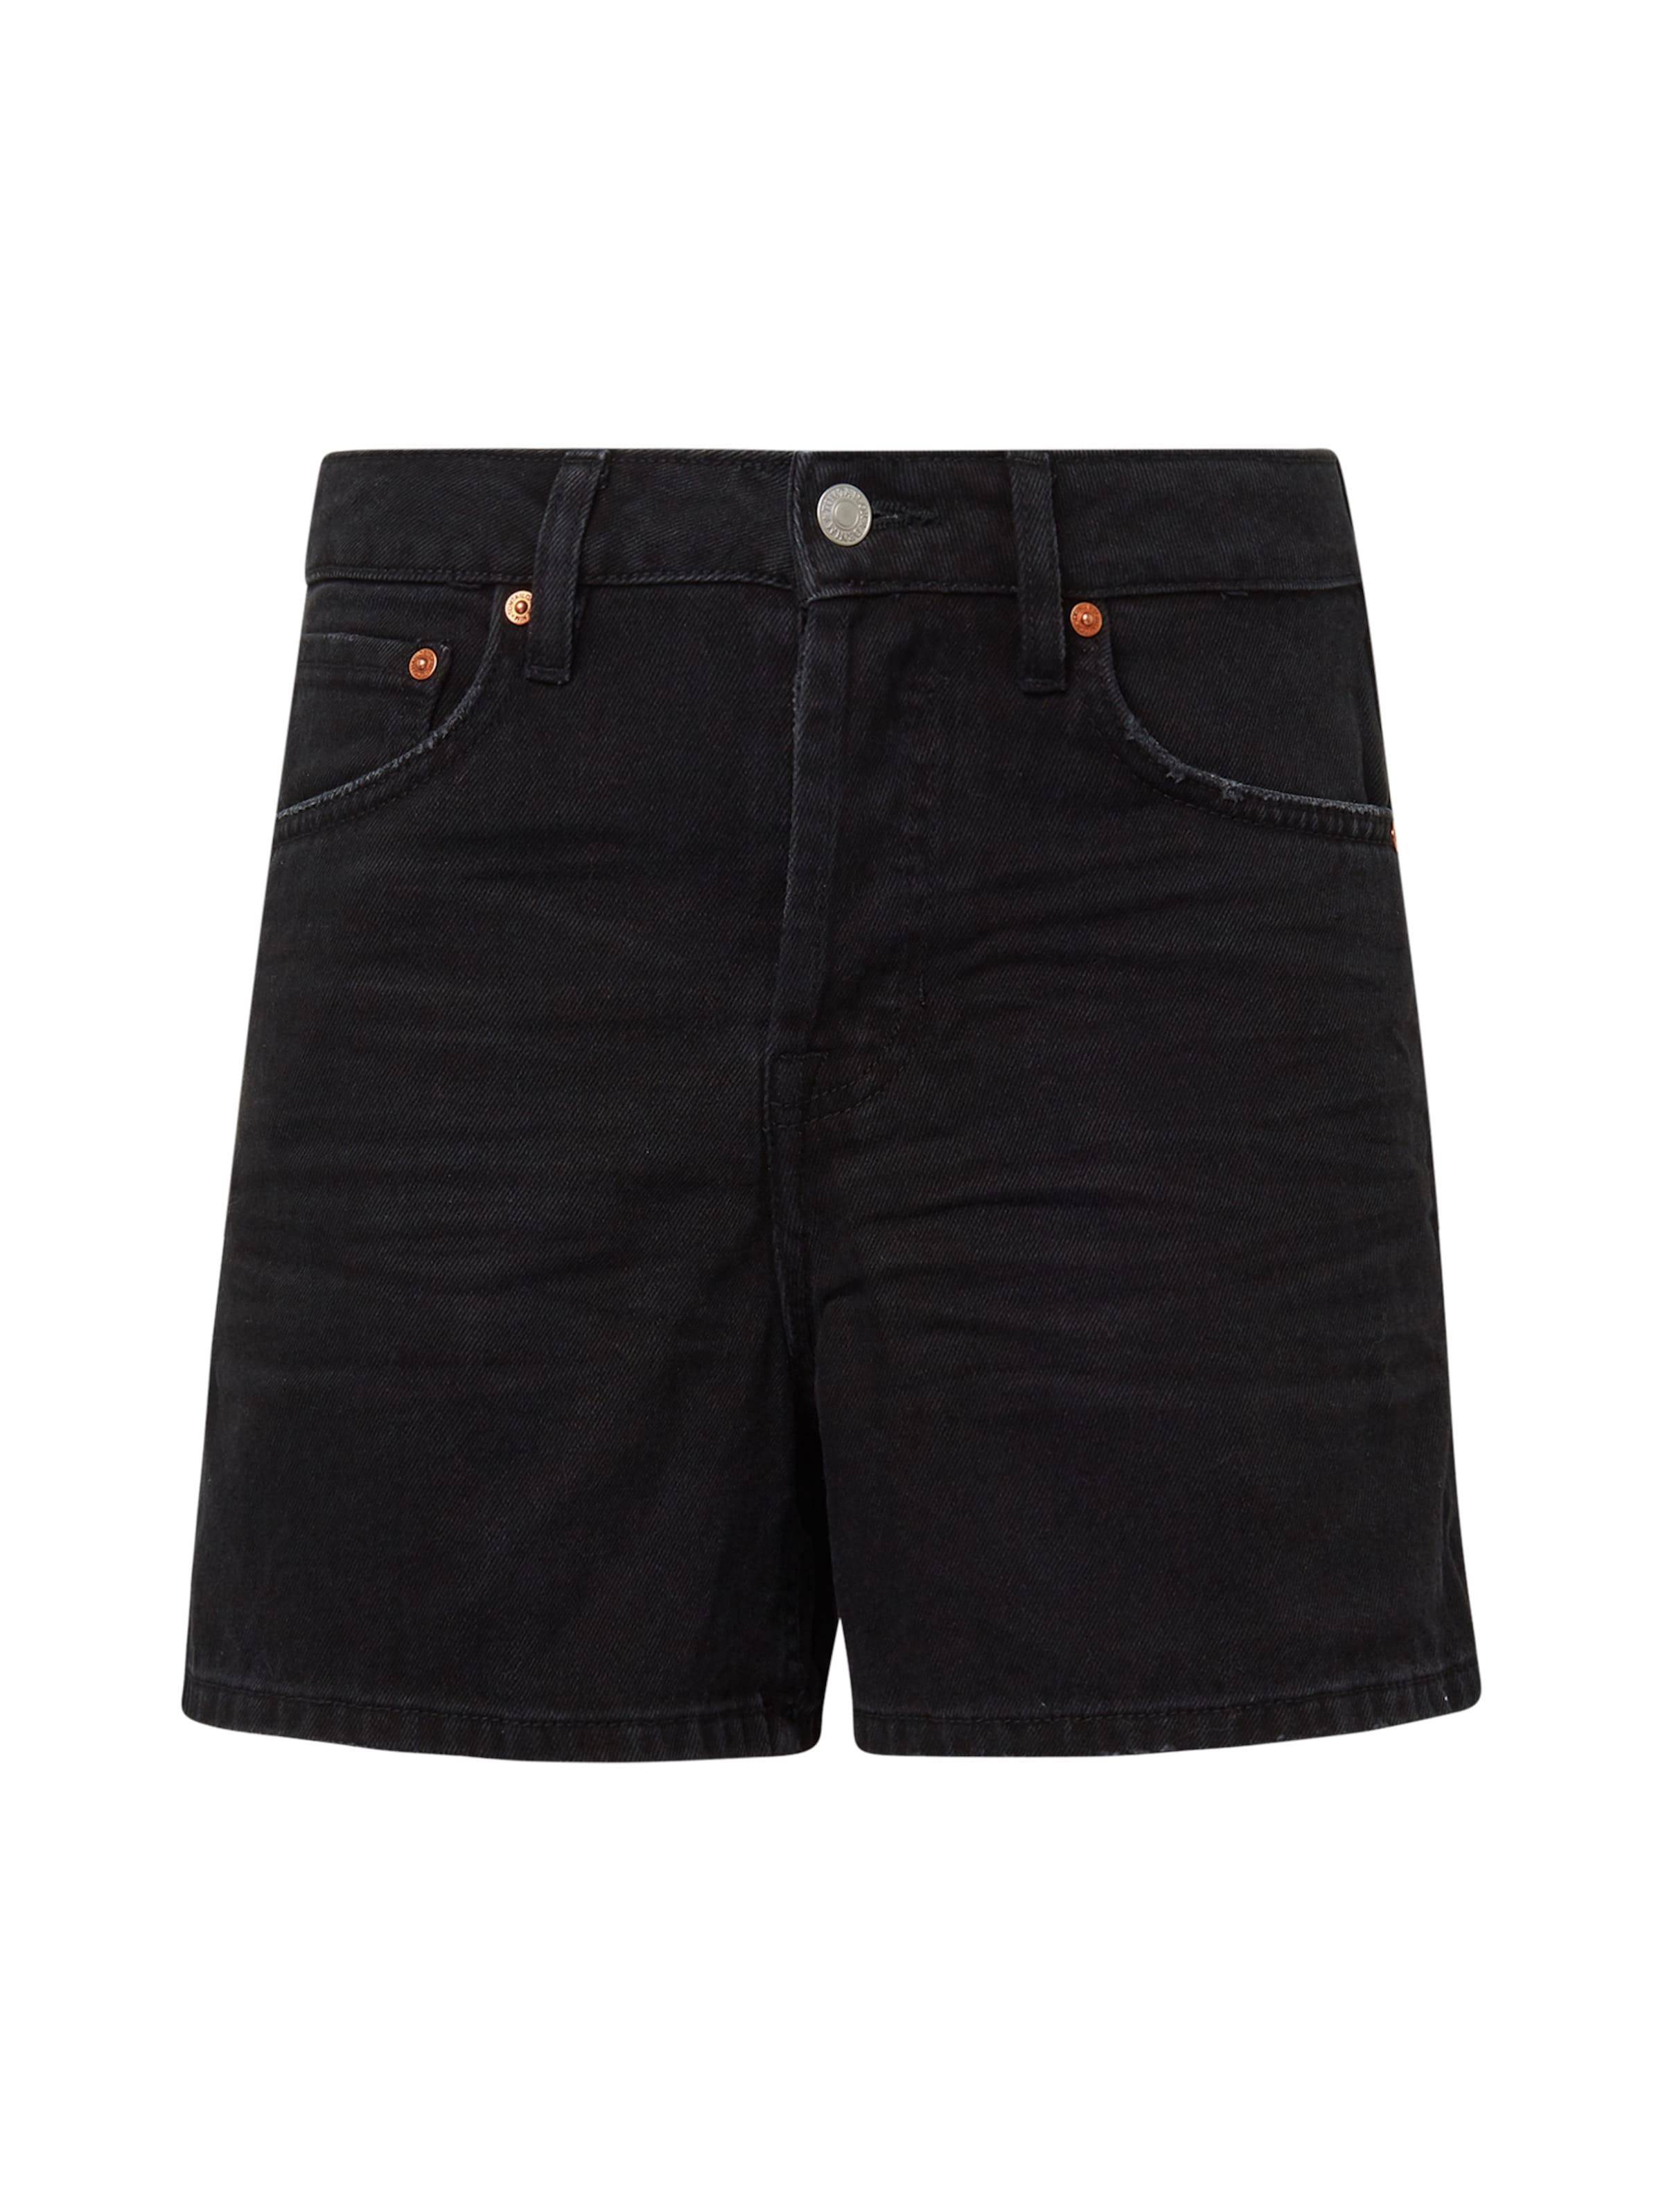 Jeanshorts Tom In Denim Black Tailor OkZuPTwXi